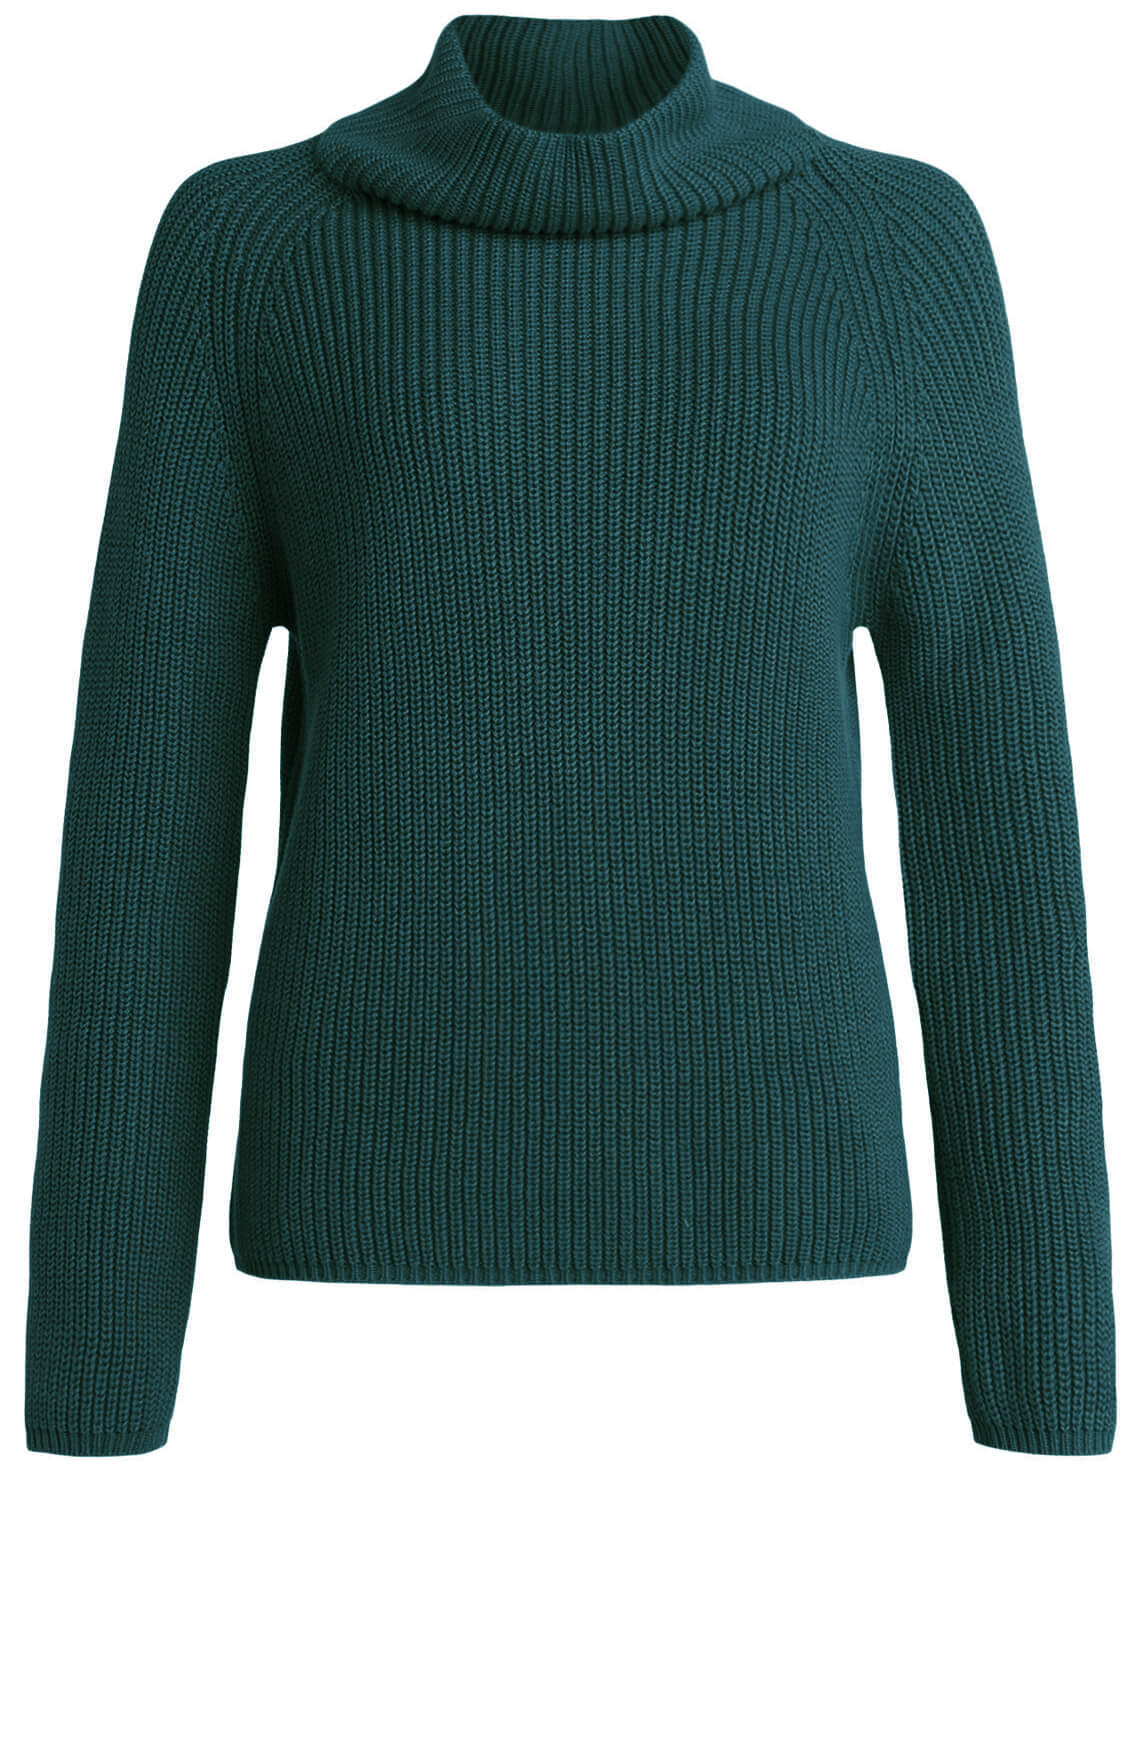 Anna Dames Gebreide pullover met colkraag groen